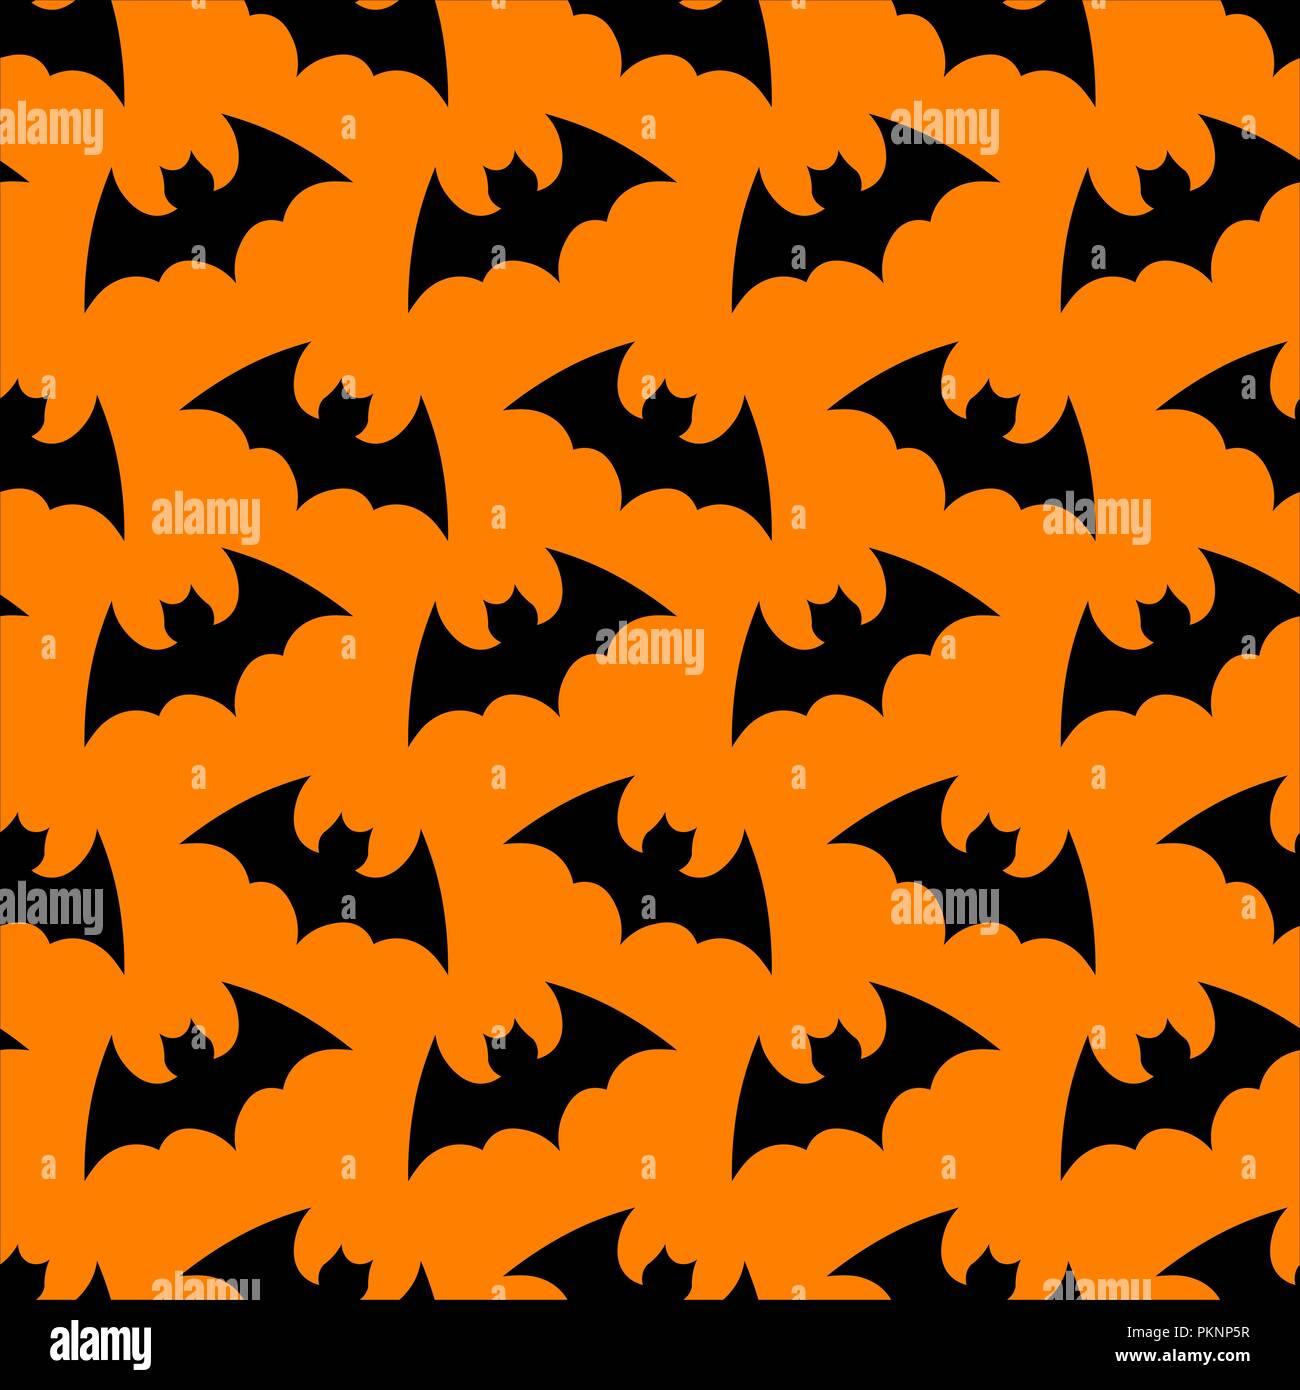 Download Halloween Bats Background Background